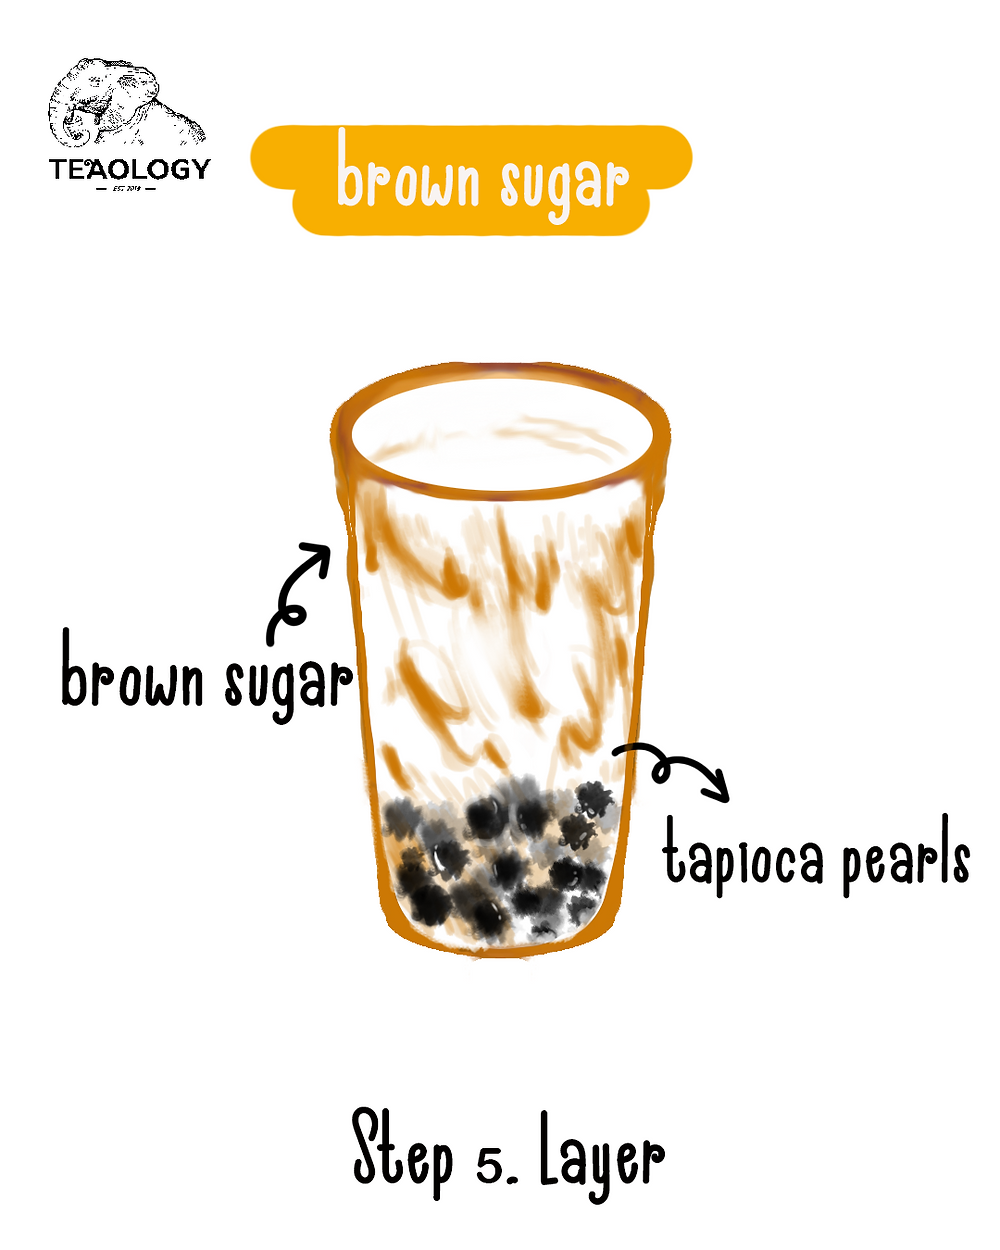 Step 5 to make brown sugar boba - Layer tapioca